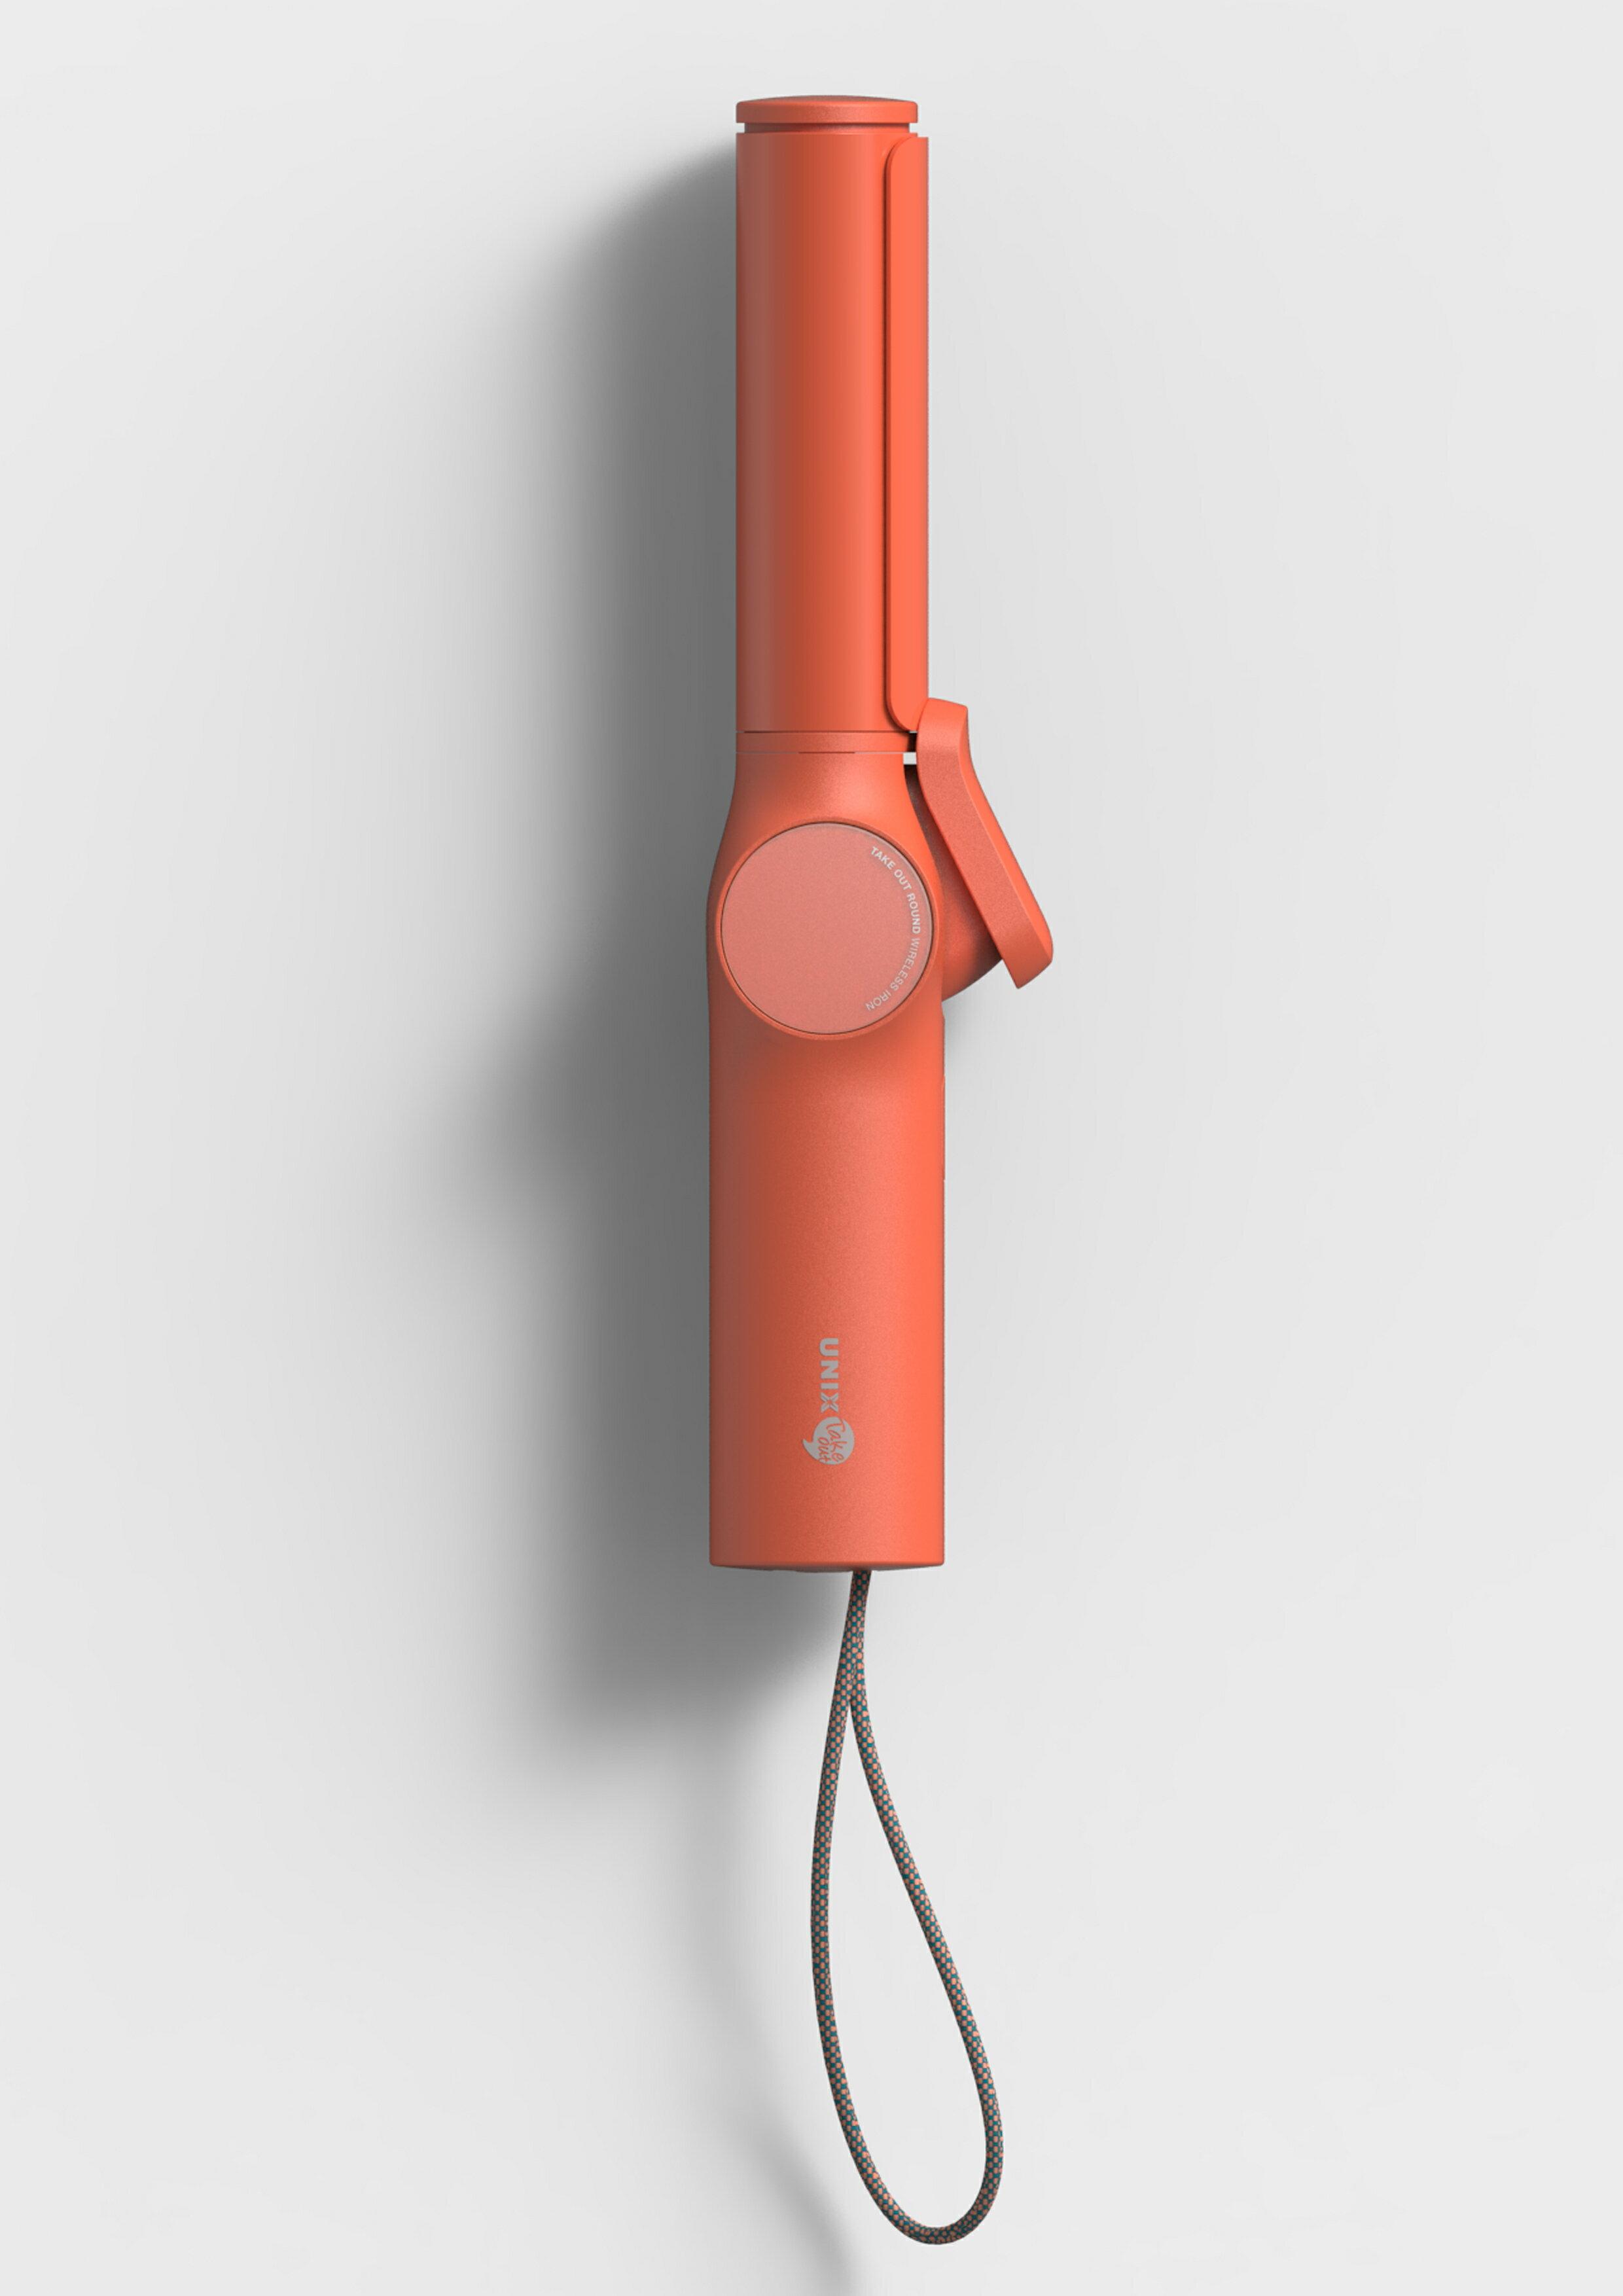 UNIX 型動無線捲髮棒 珊瑚紅(贈Type-C線組*1)